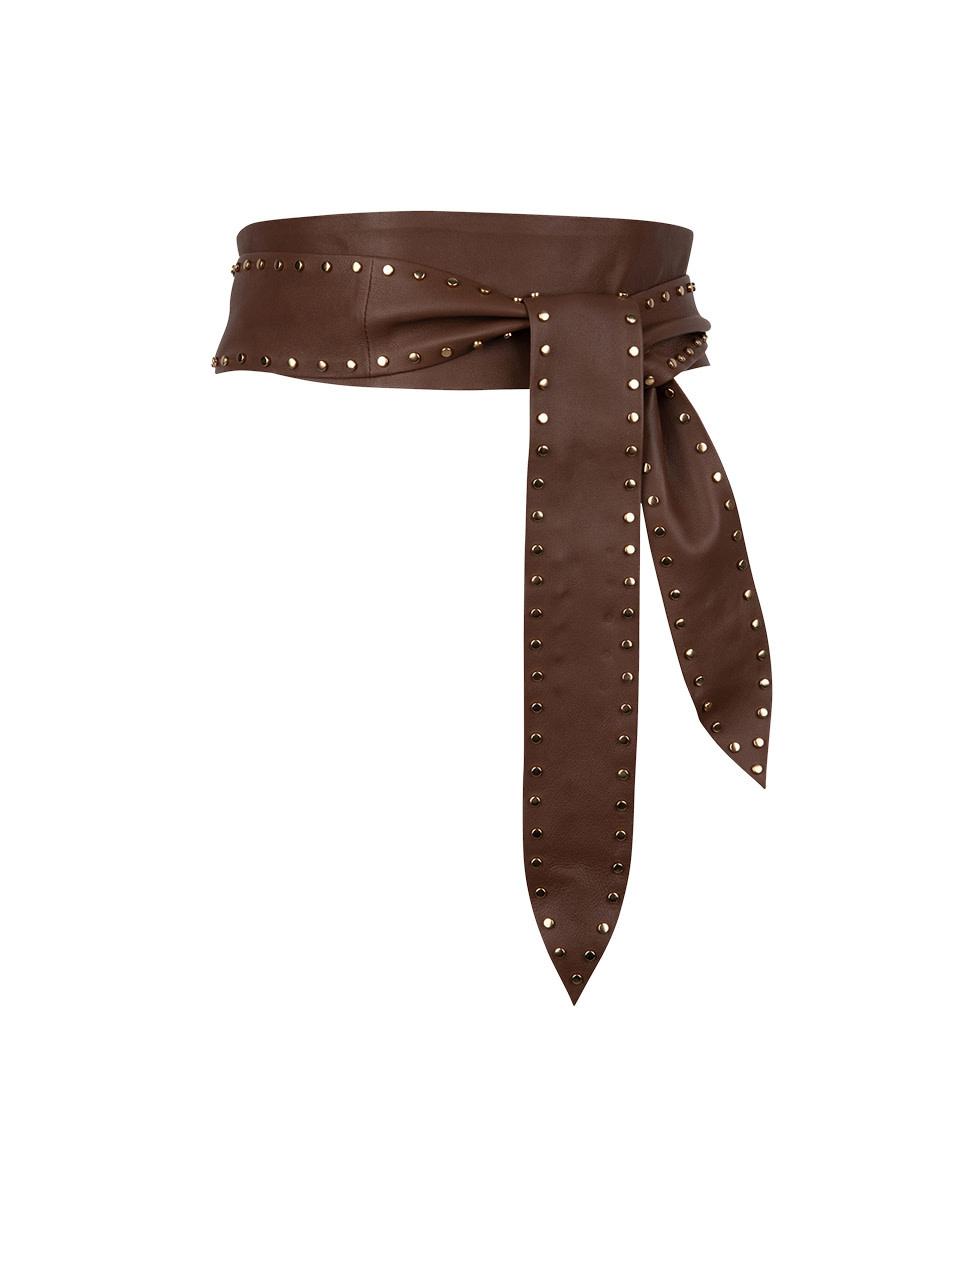 New Markala leather belt wood brown-1